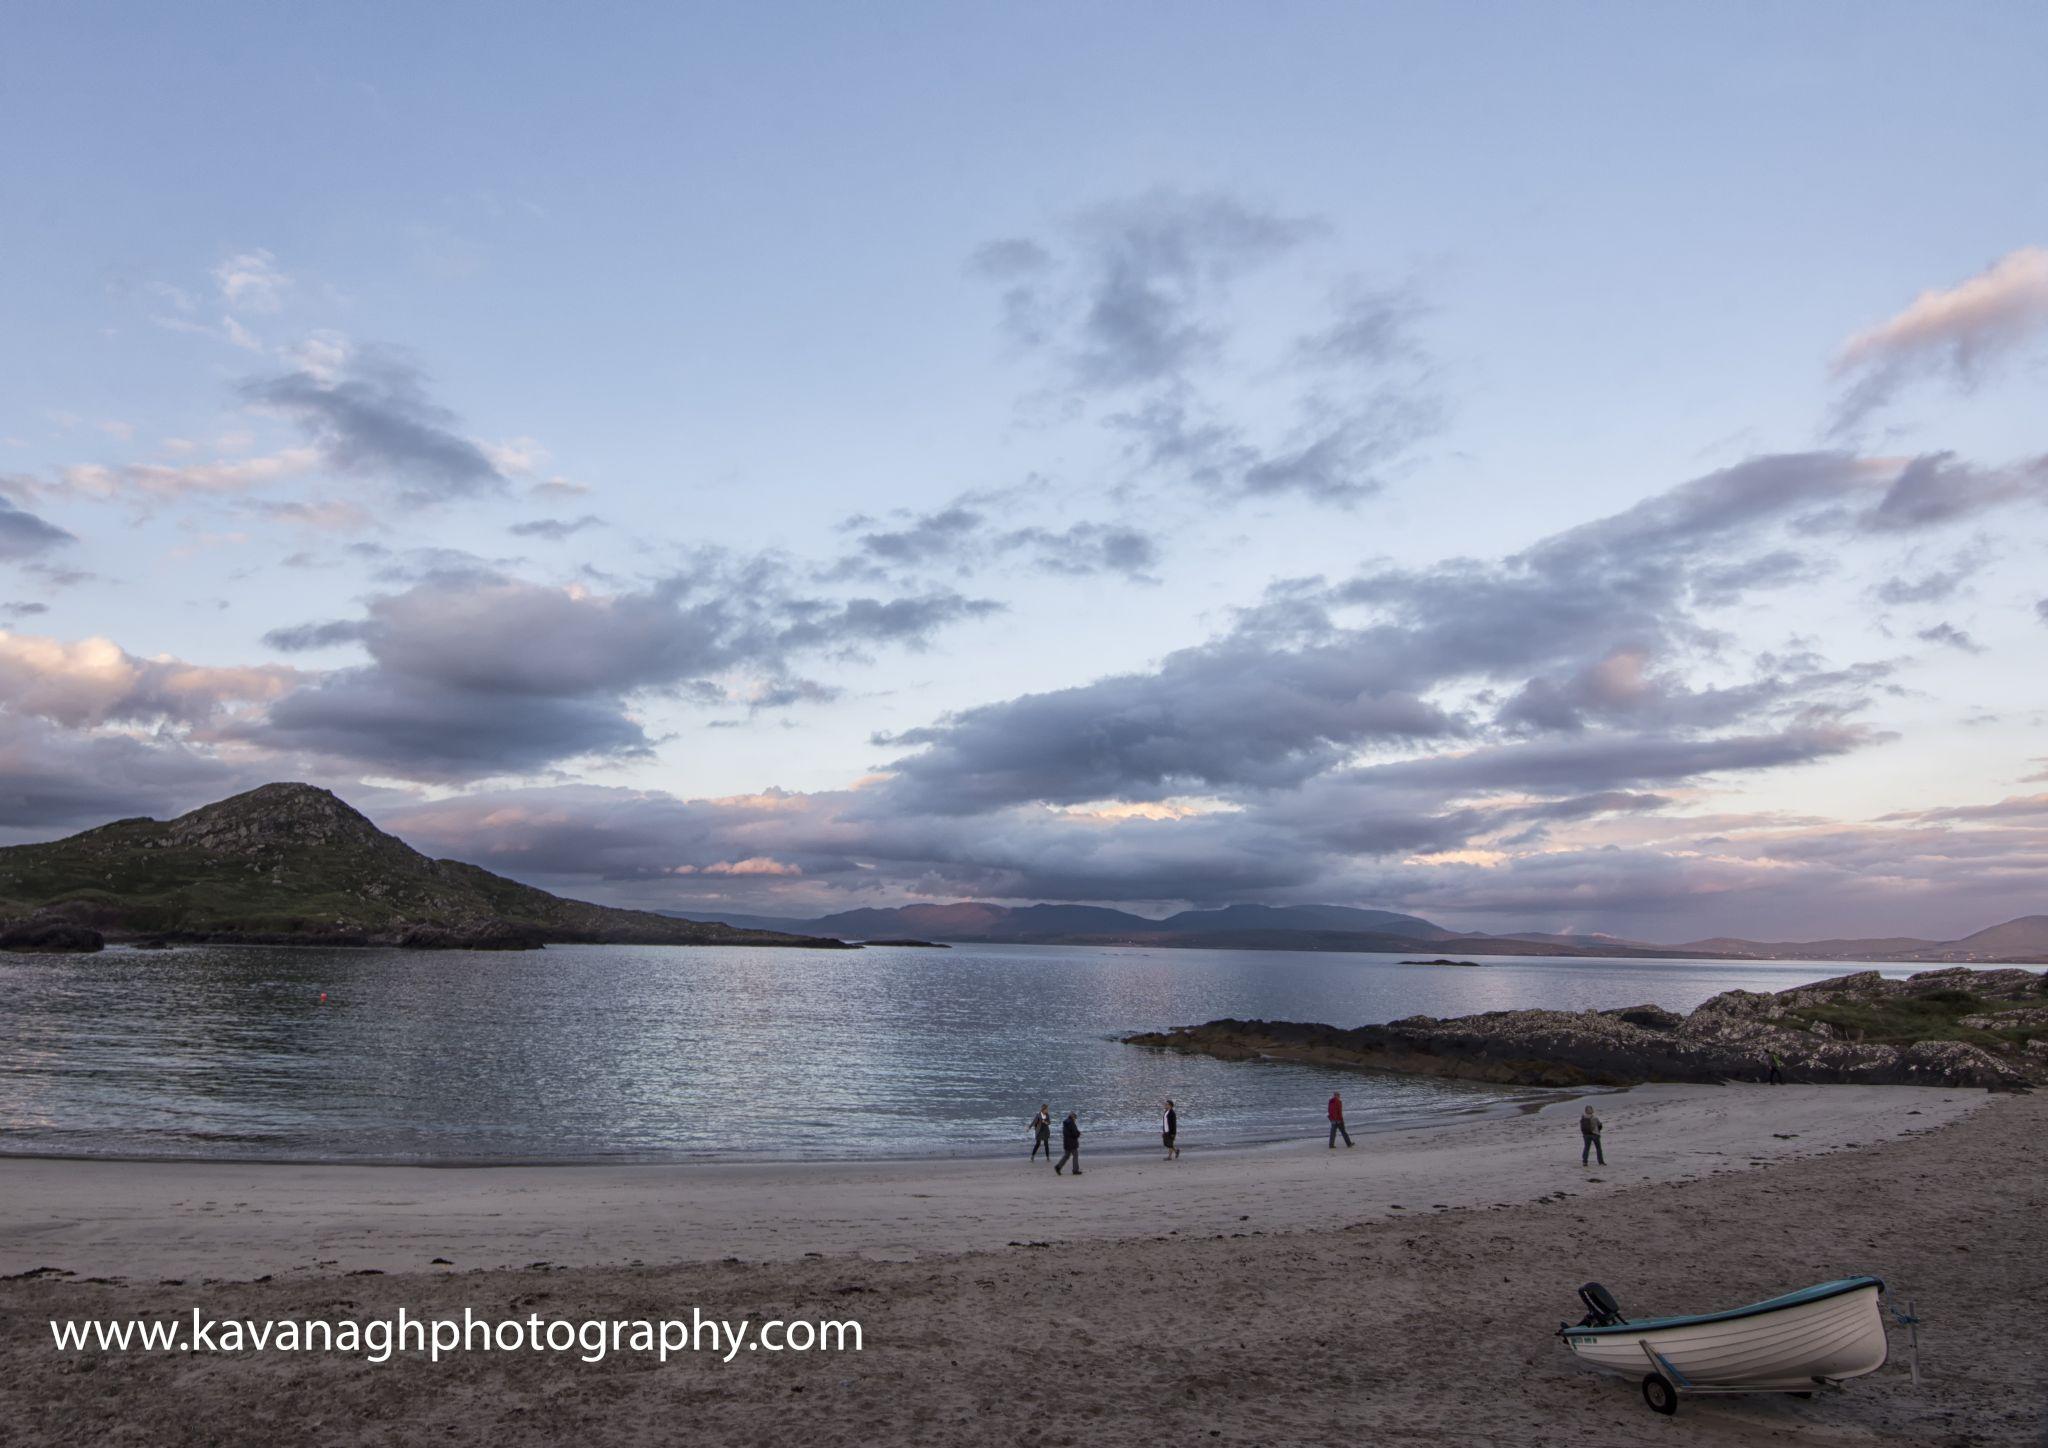 O Carrolls Cove, Ireland